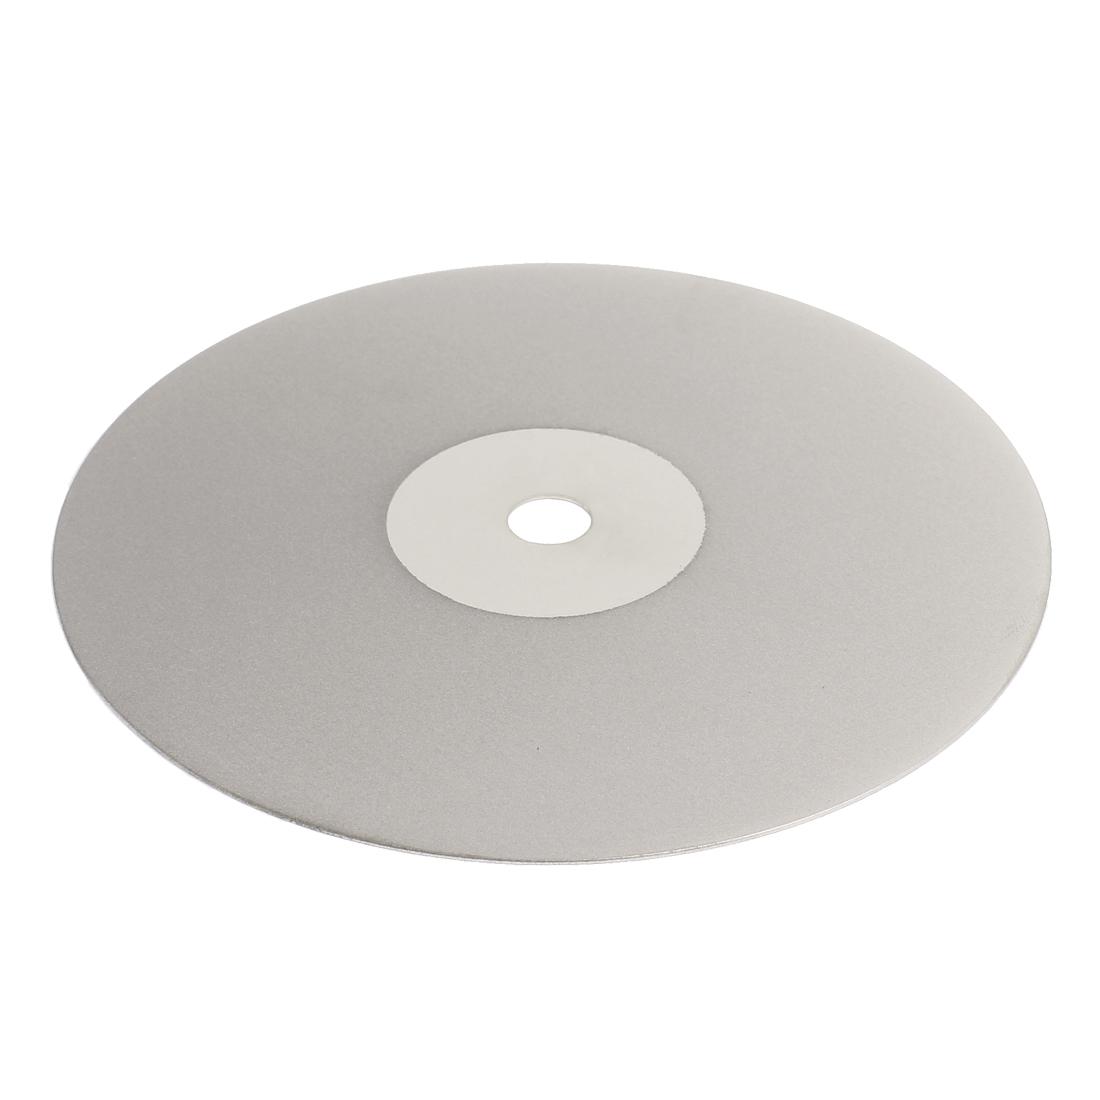 Marble Granite Stone 150mmx13mm Diamond Coated Grind Grinding Wheel 600 Grit